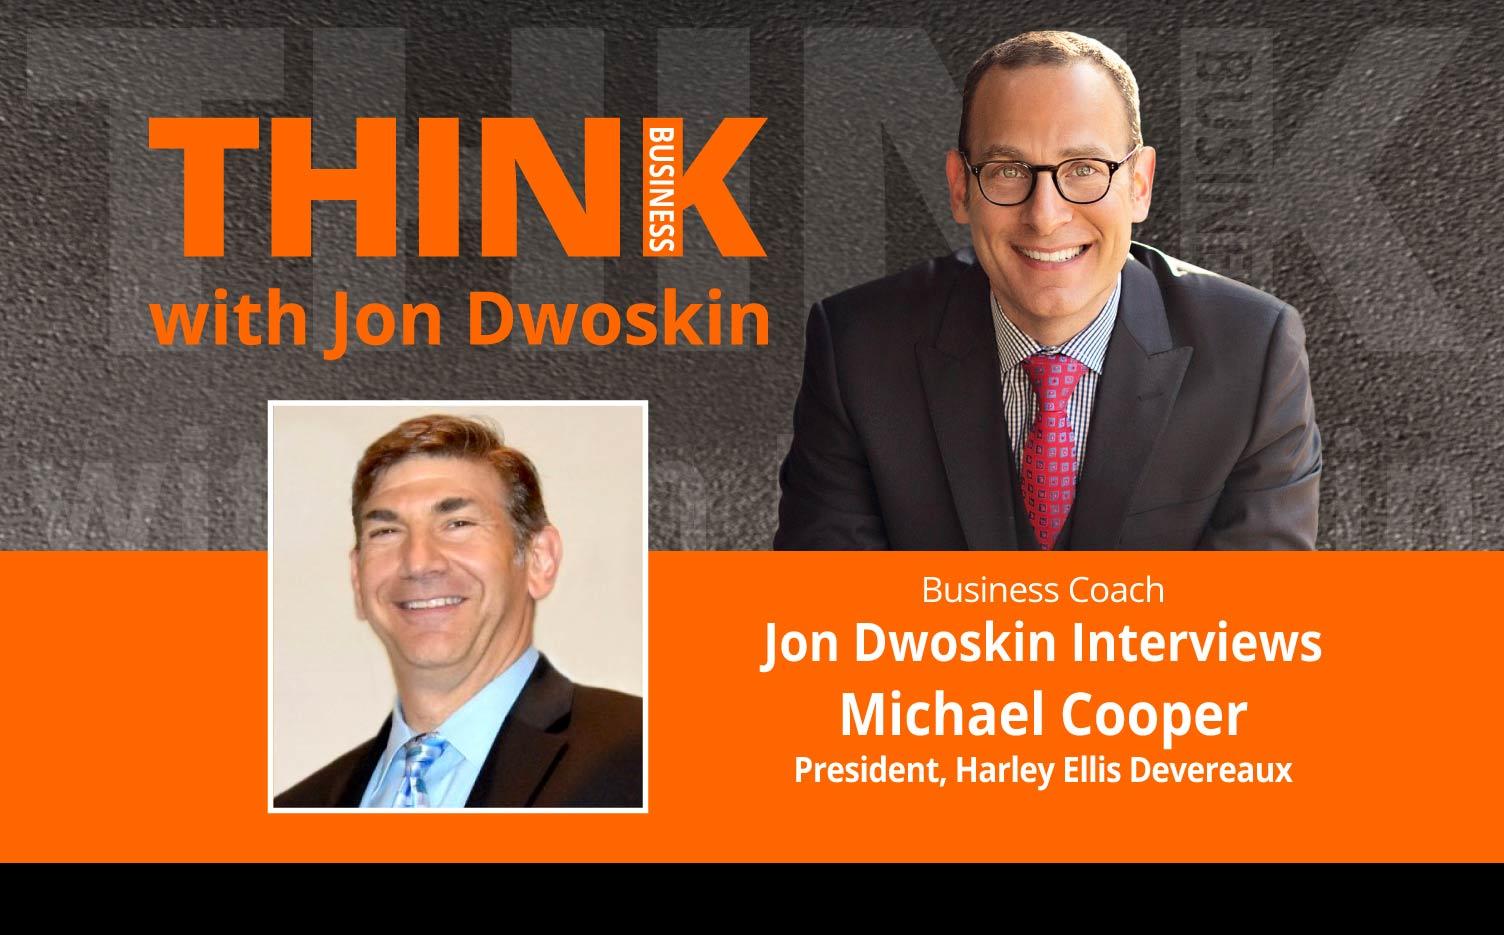 THINK Business Podcast: Jon Dwoskin Interviews Michael Cooper, President, Harley Ellis Devereaux